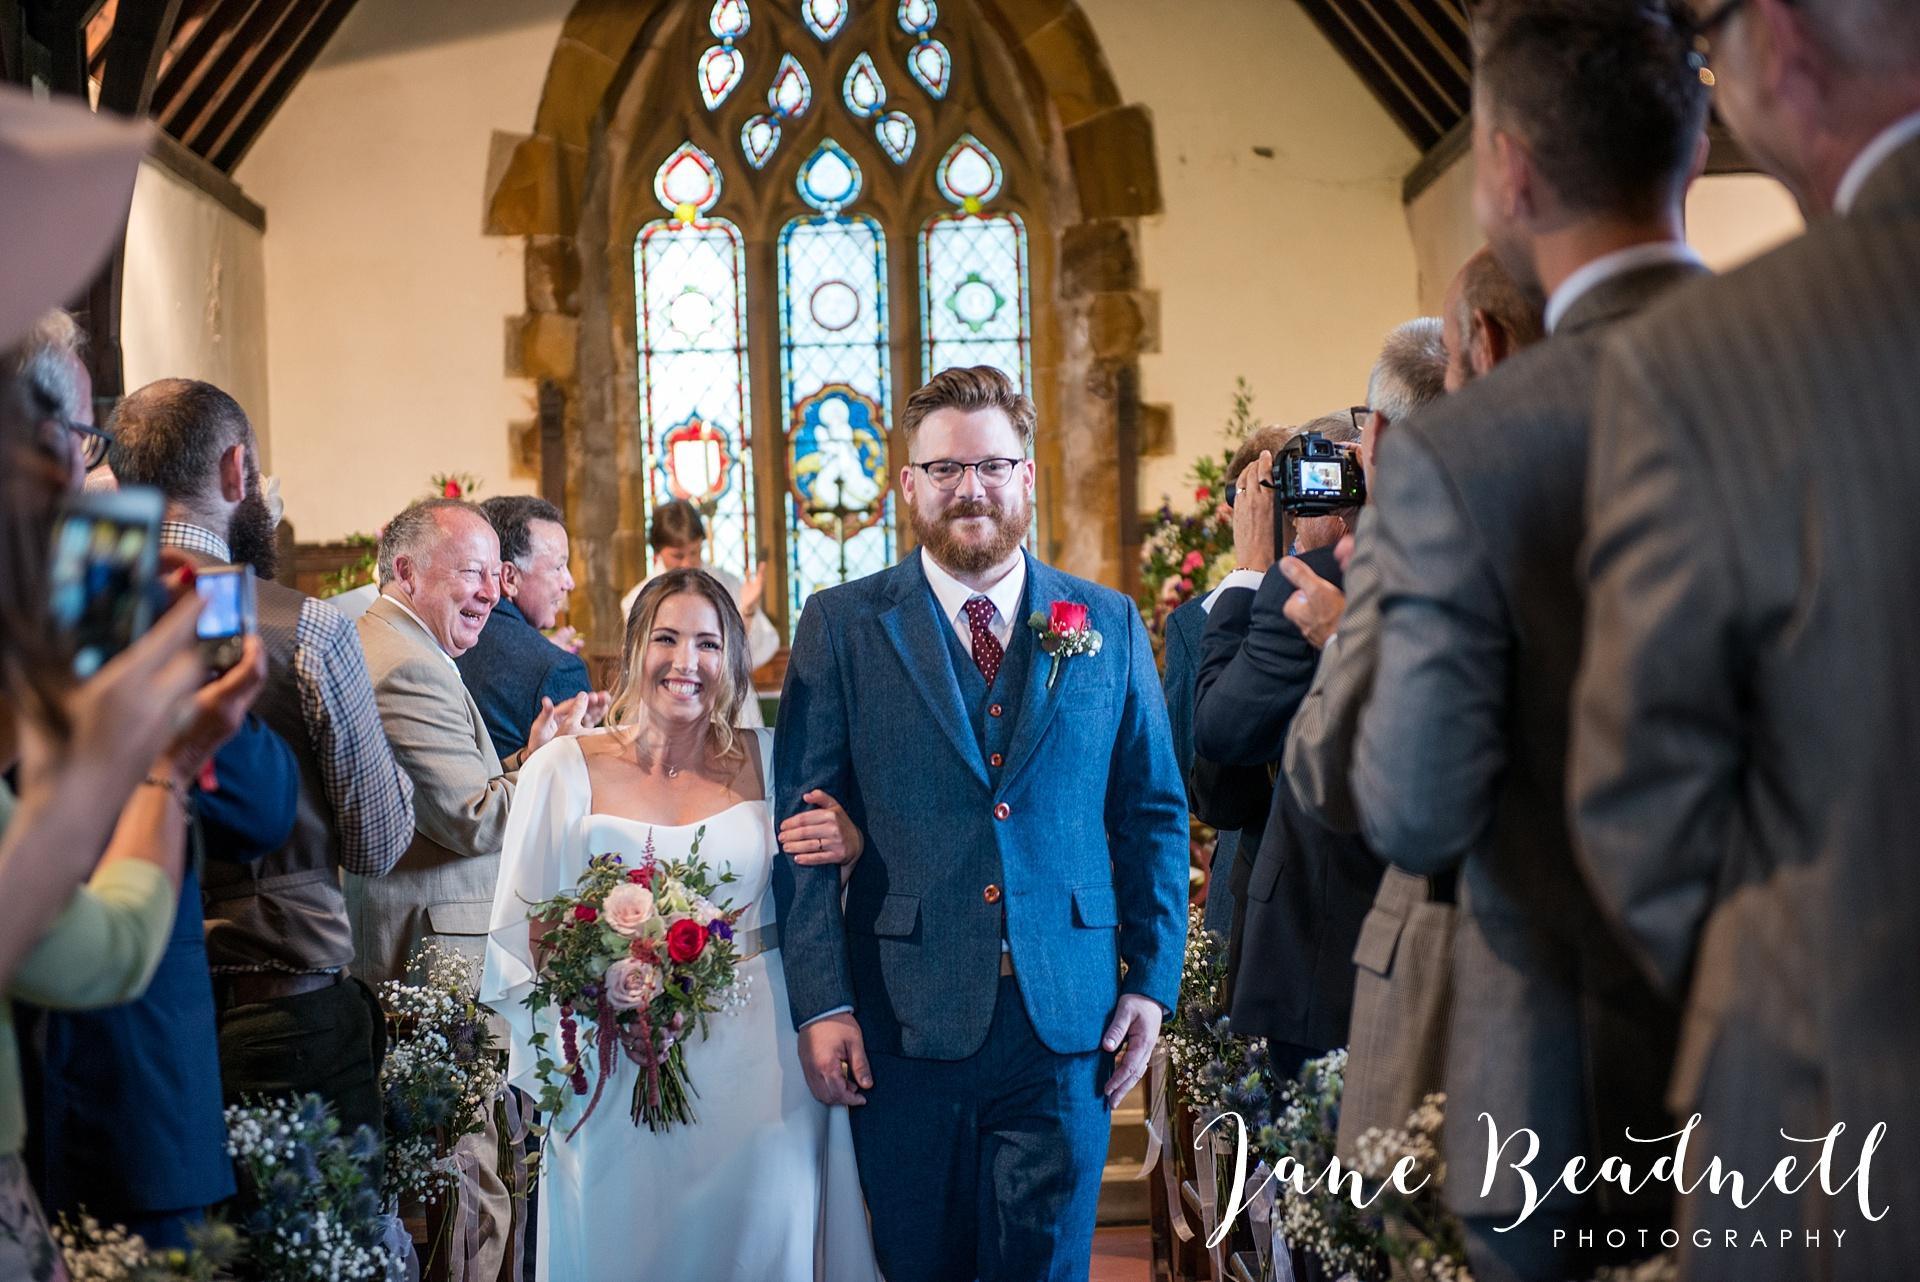 fine-art-wedding-photographer-jane-beadnell-yorkshire-wedding-photographer_0052